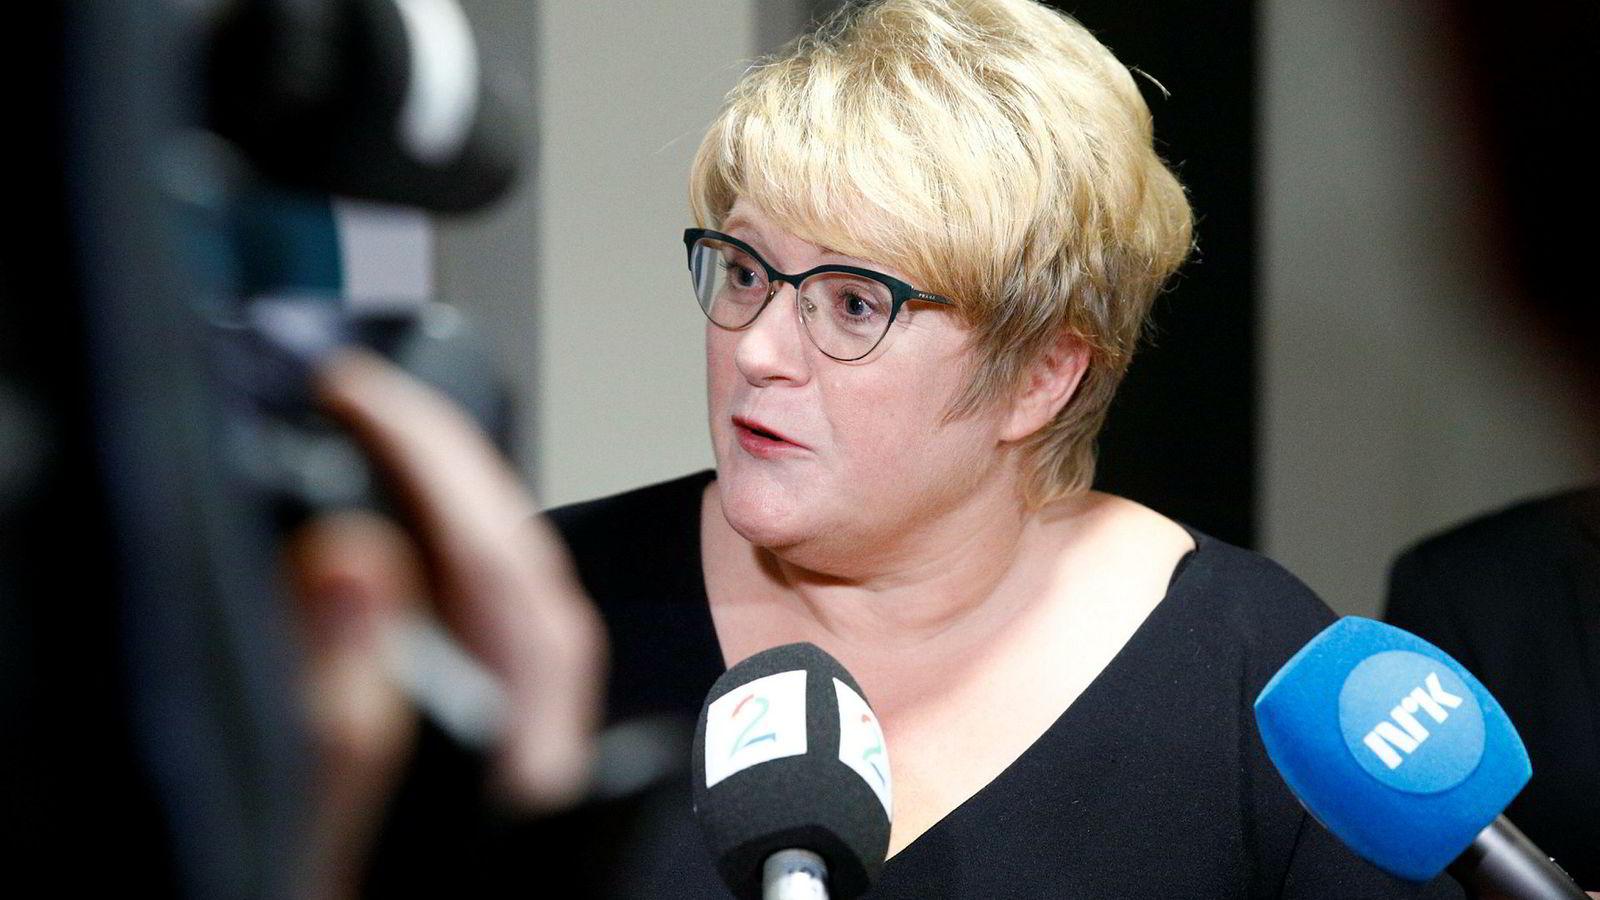 Venstres leder Trine Skei Grande.